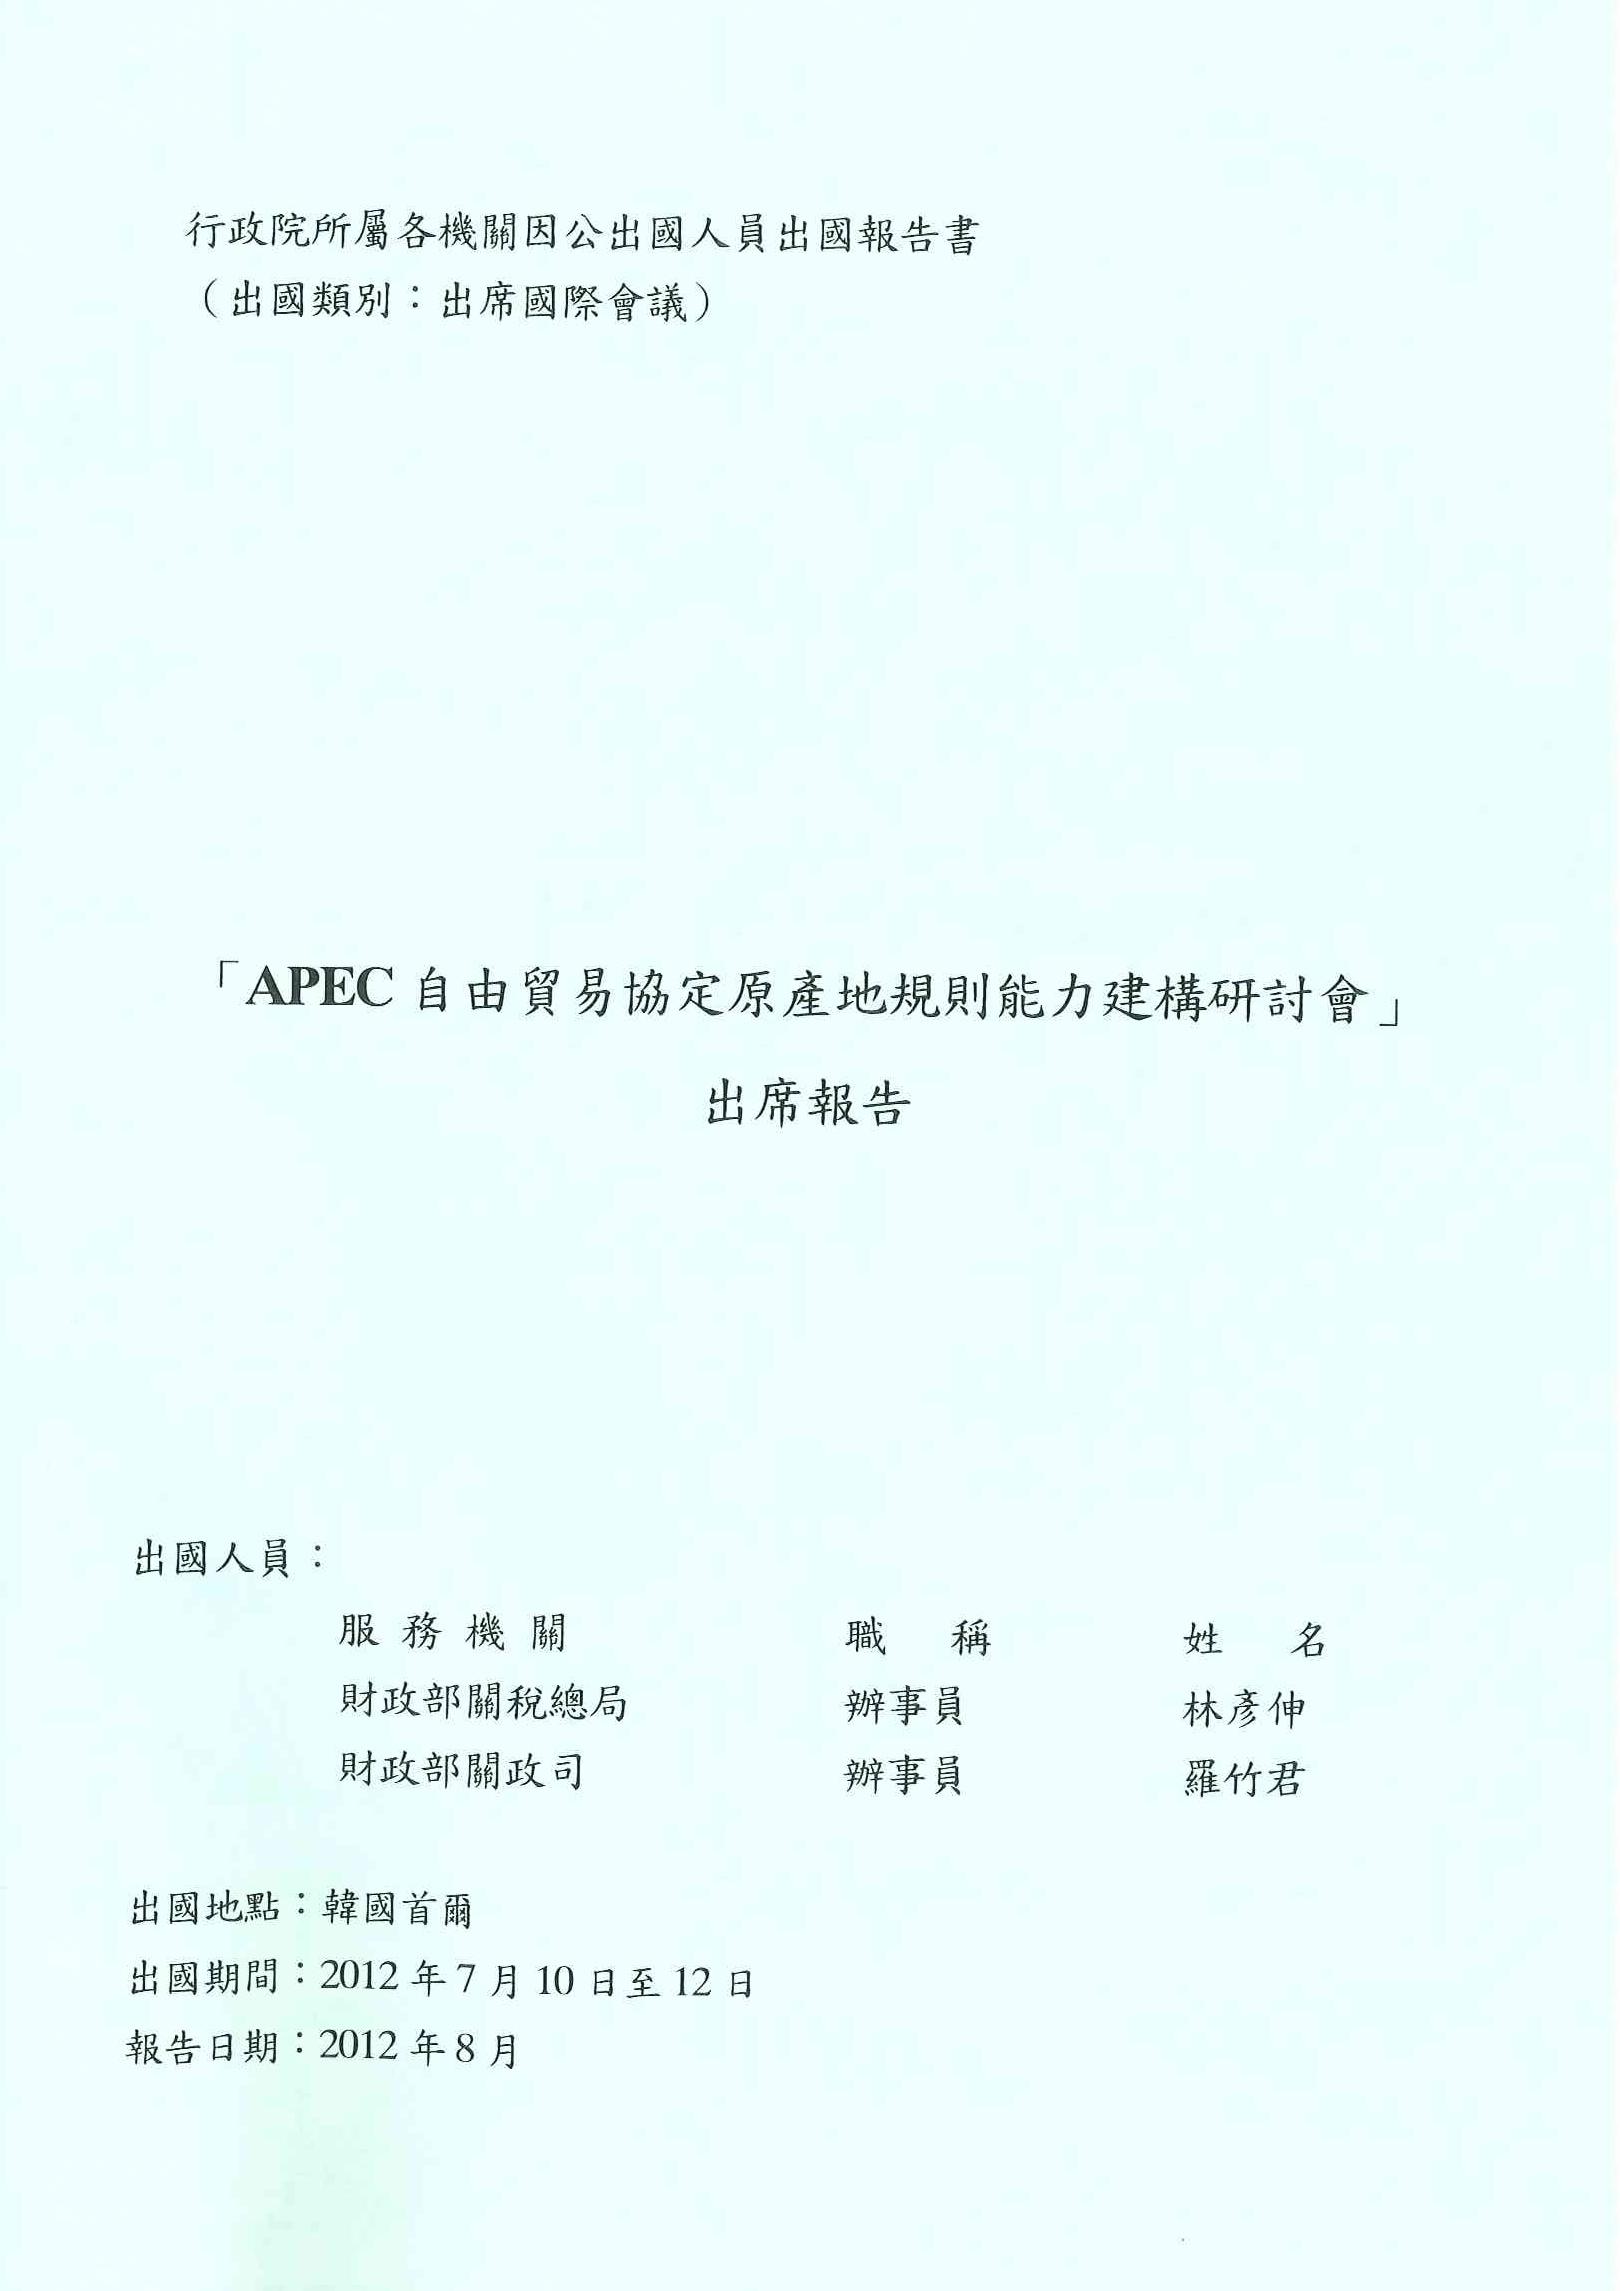 「APEC自由貿易協定原產地規則能力建構研討會」出席報告